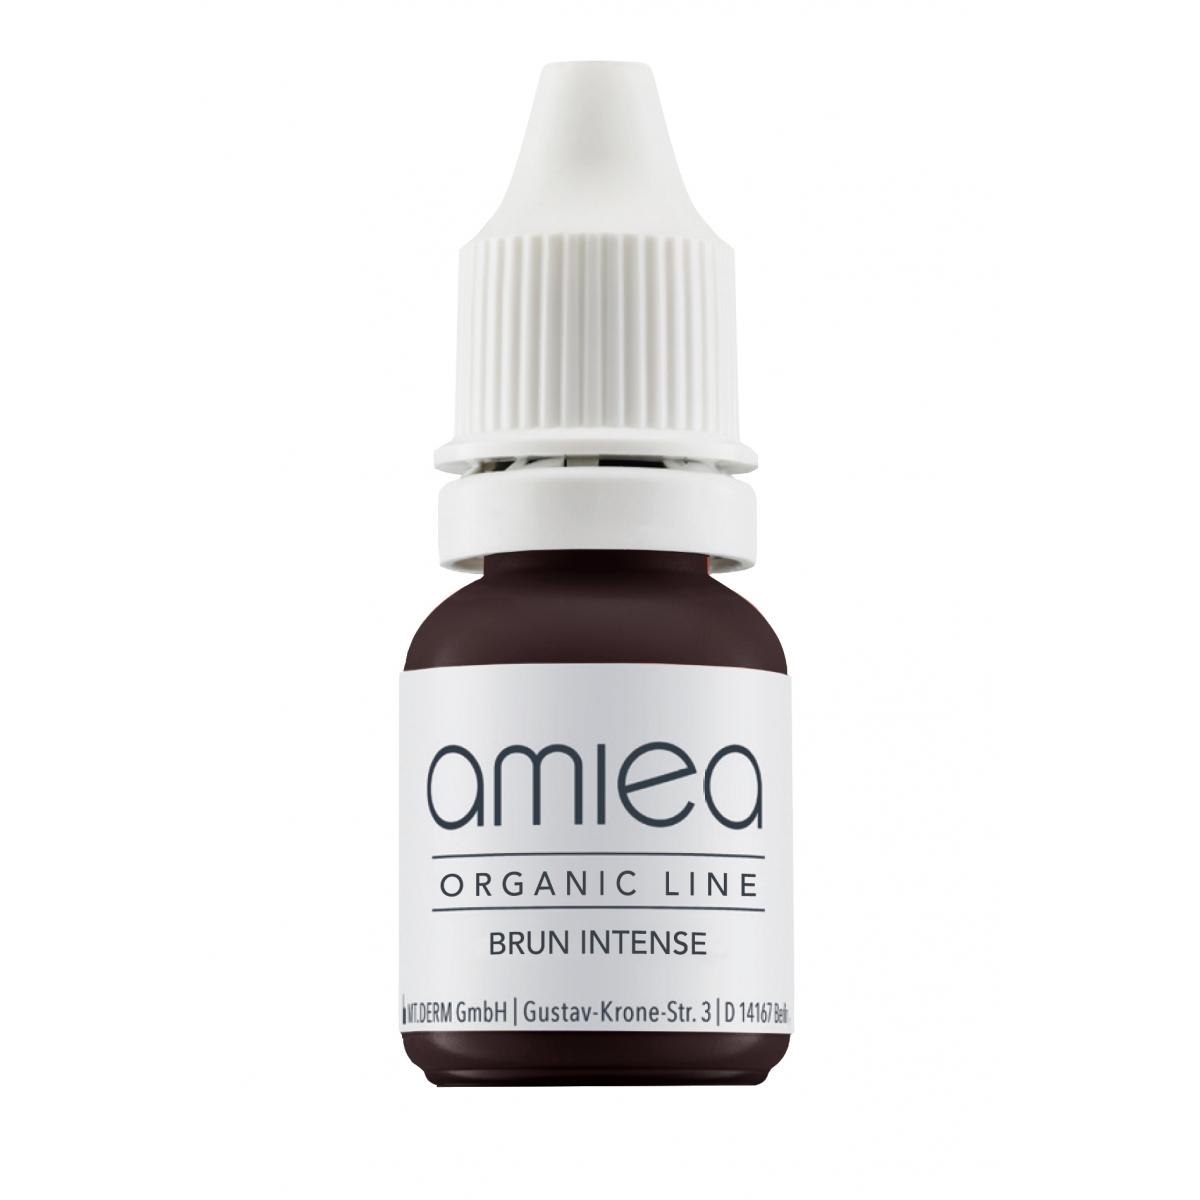 ORGANIC LINE (10ml) - PIGMENT BRUN INTENSE ORGANICLINE AMIEA (10 ml)